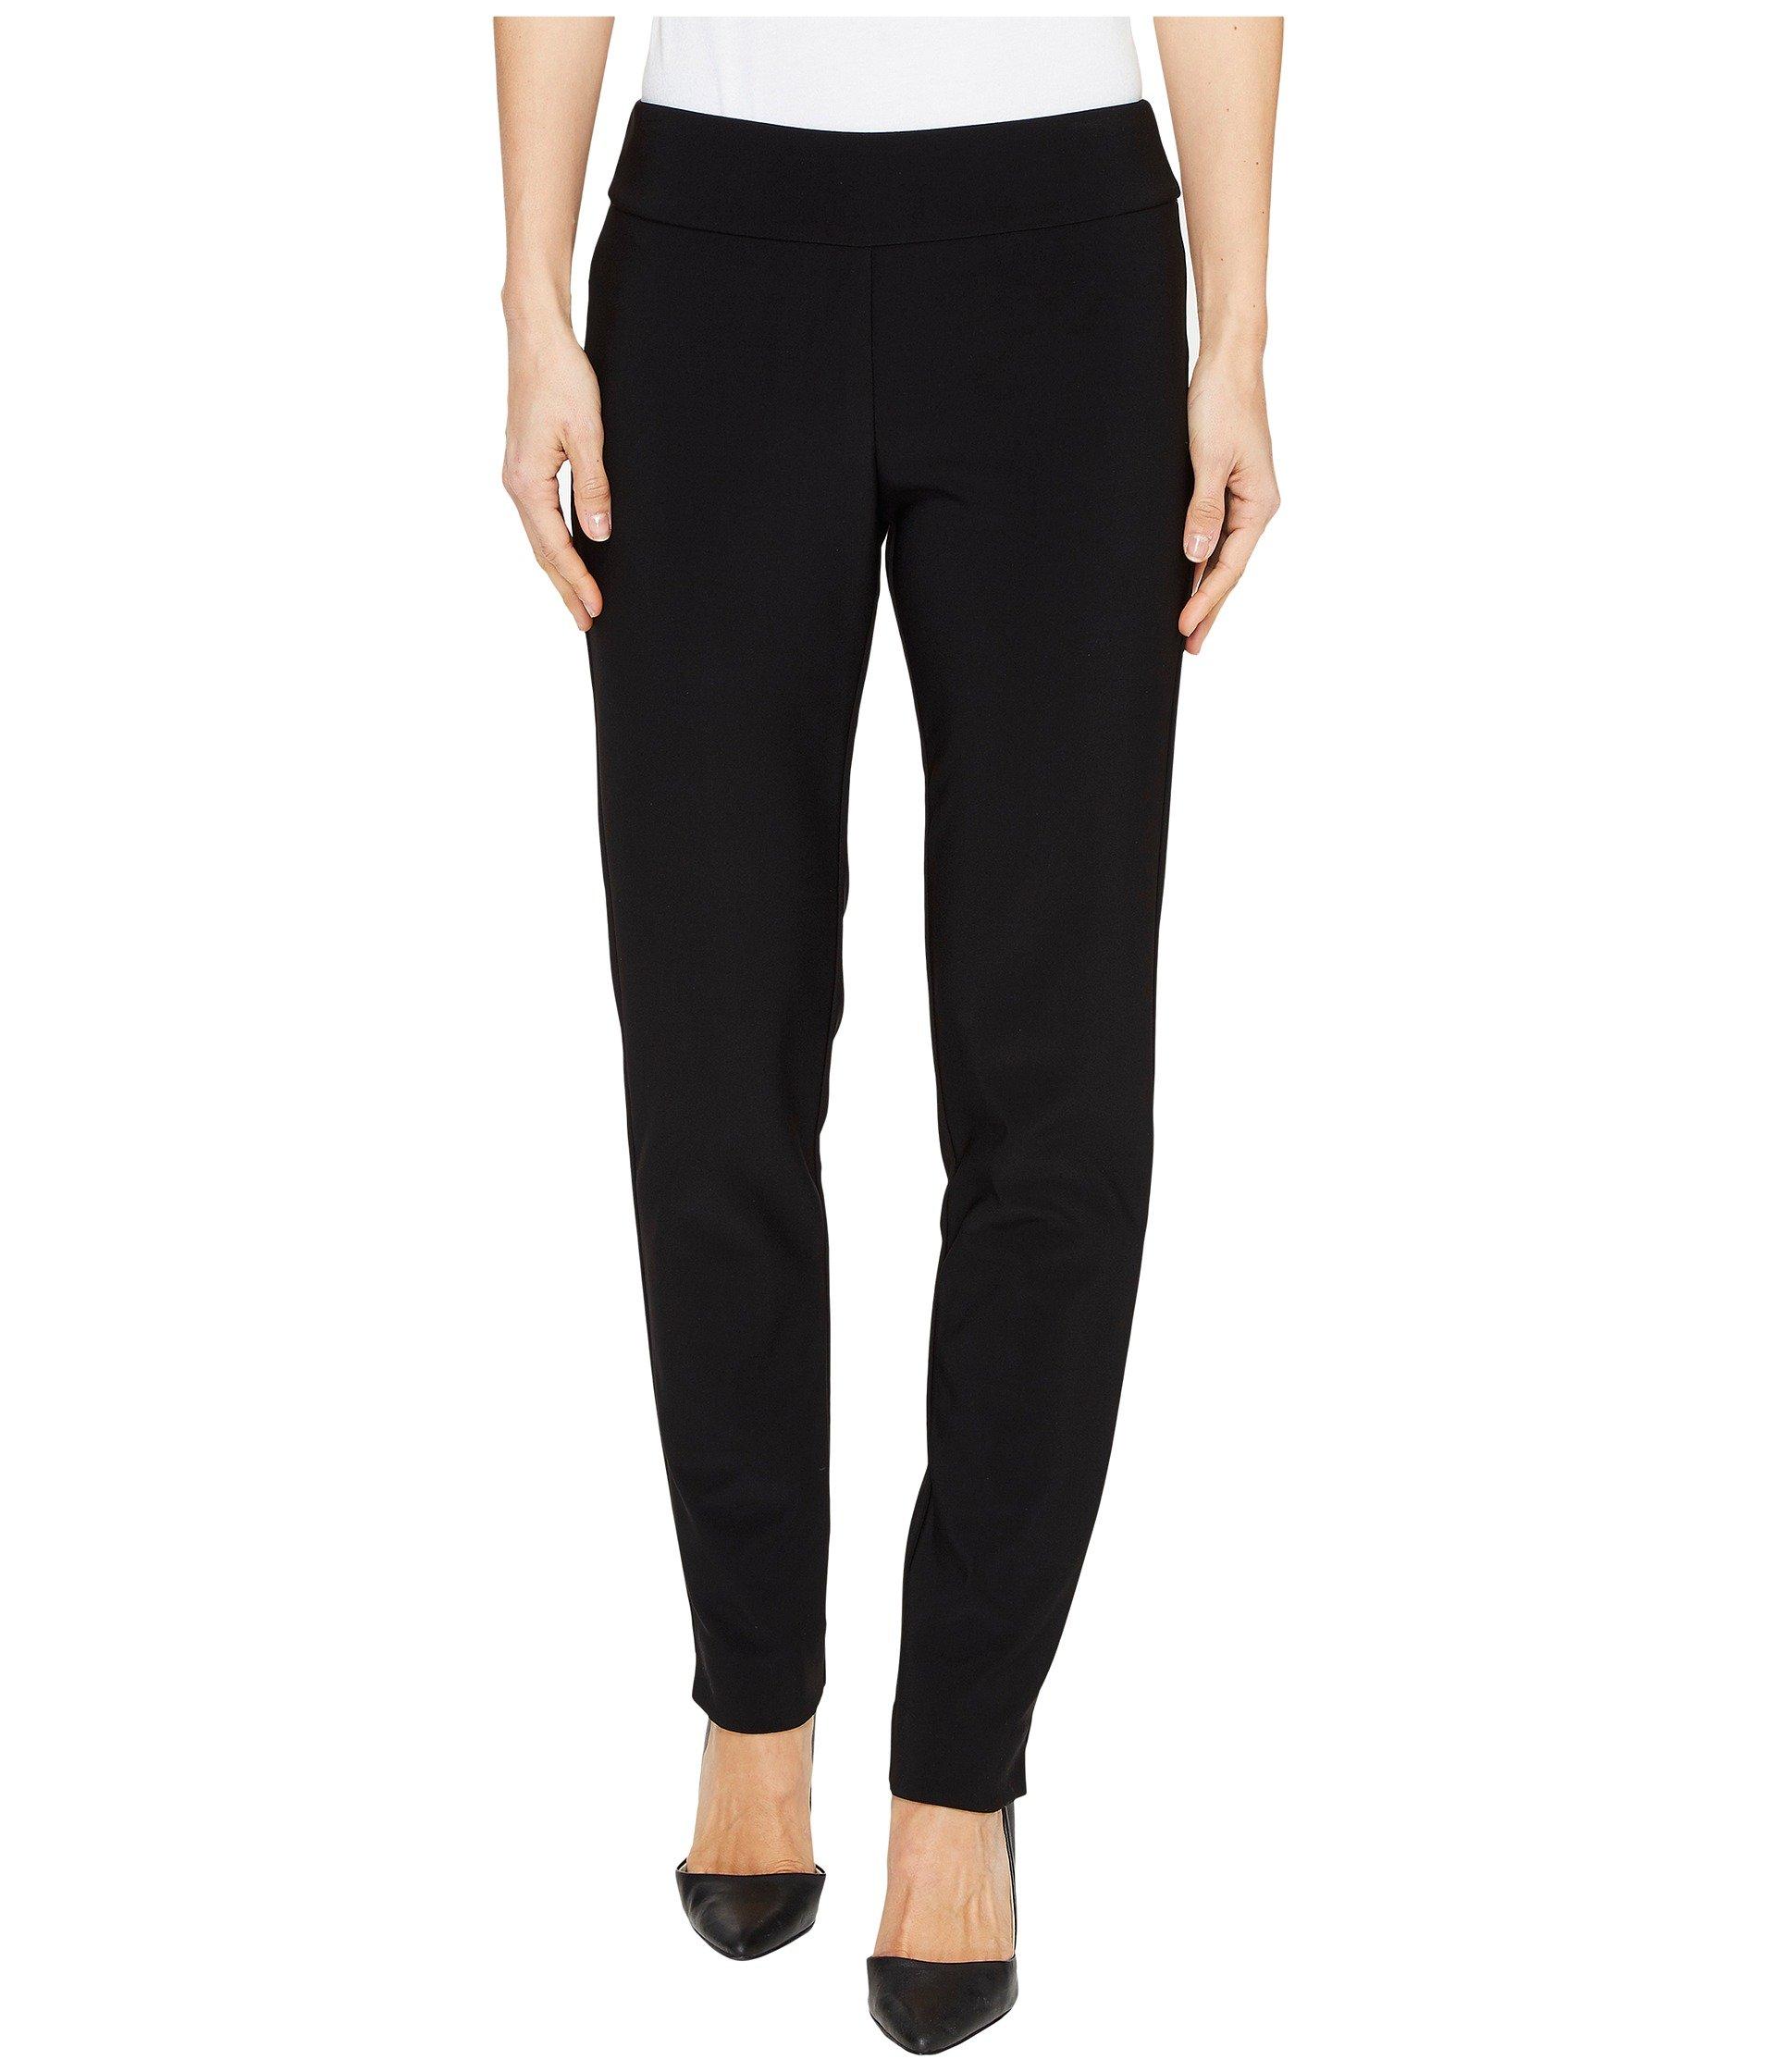 Krazy Larry Women's Microfiber Long Skinny Dress Pants Black Pants